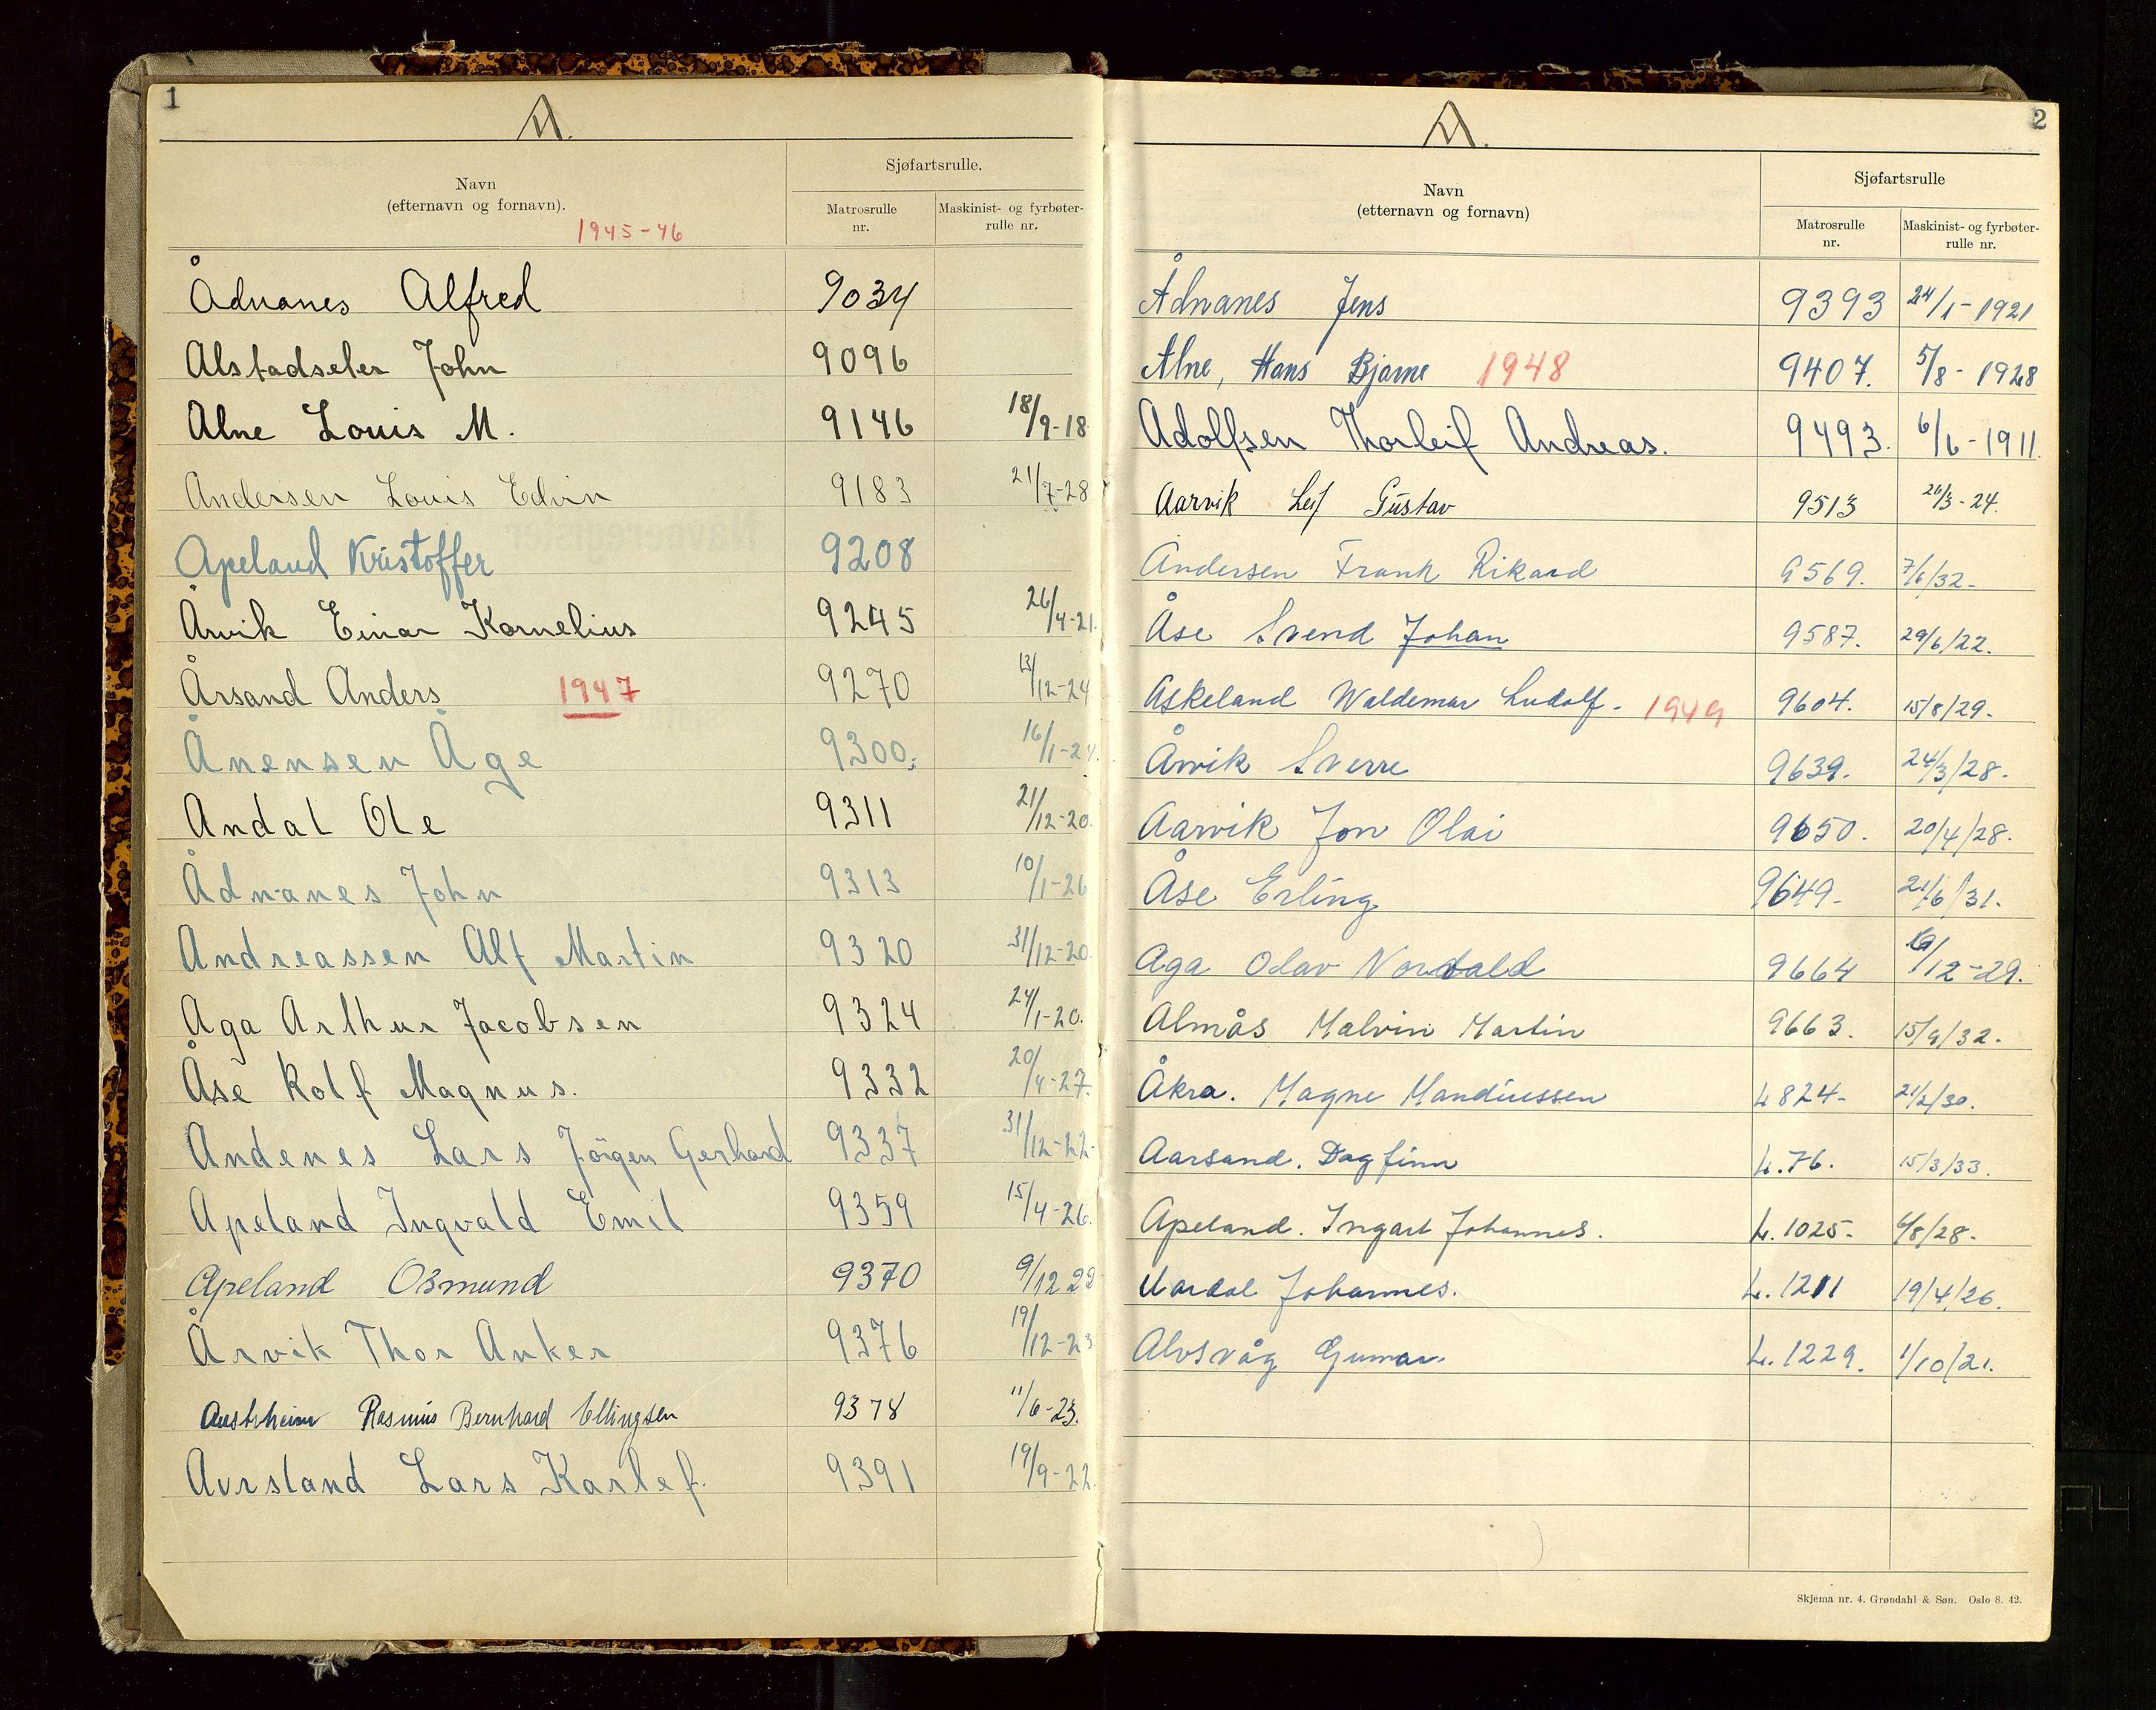 SAST, Haugesund sjømannskontor, F/Fb/Fba/L0007: Navneregister med henvisning til rullenummer (etternavn) Haugesund krets , 1944, s. 1-2